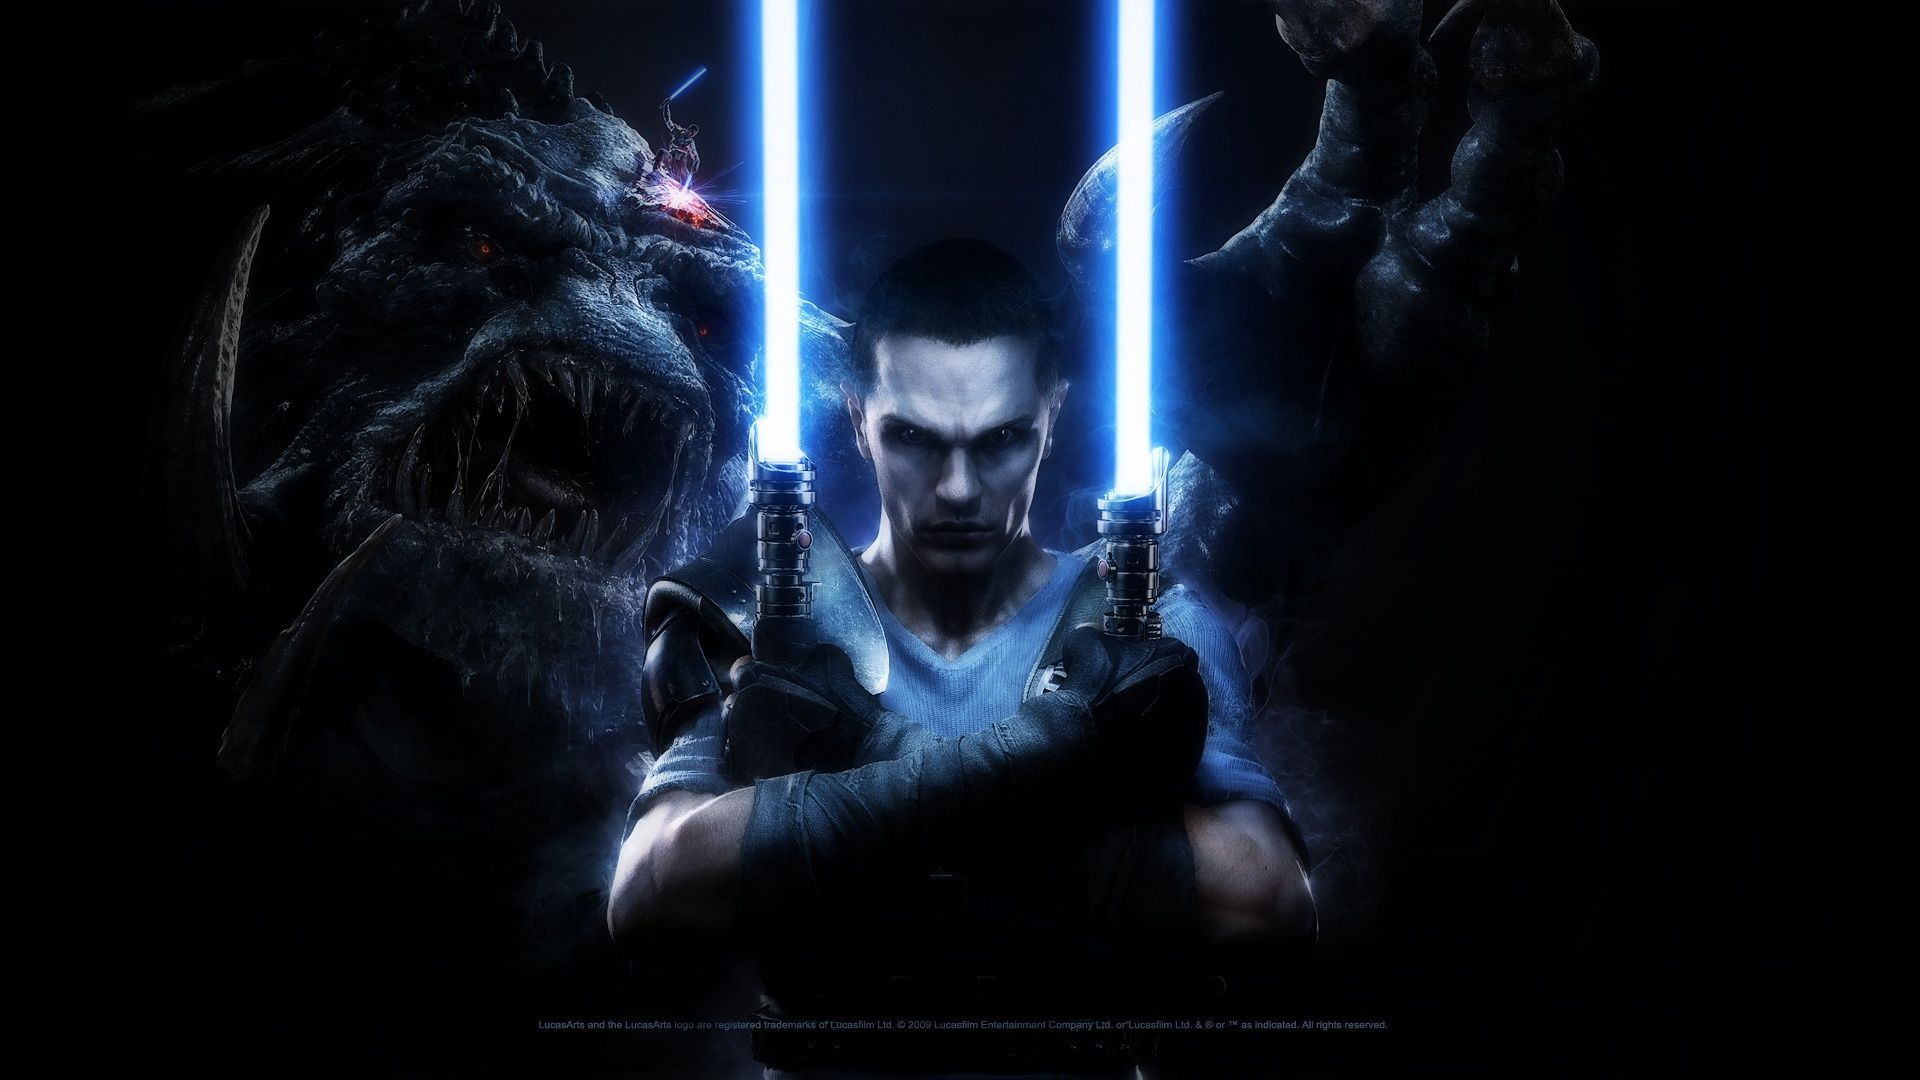 Star Wars Unleashed HD Wallpaper